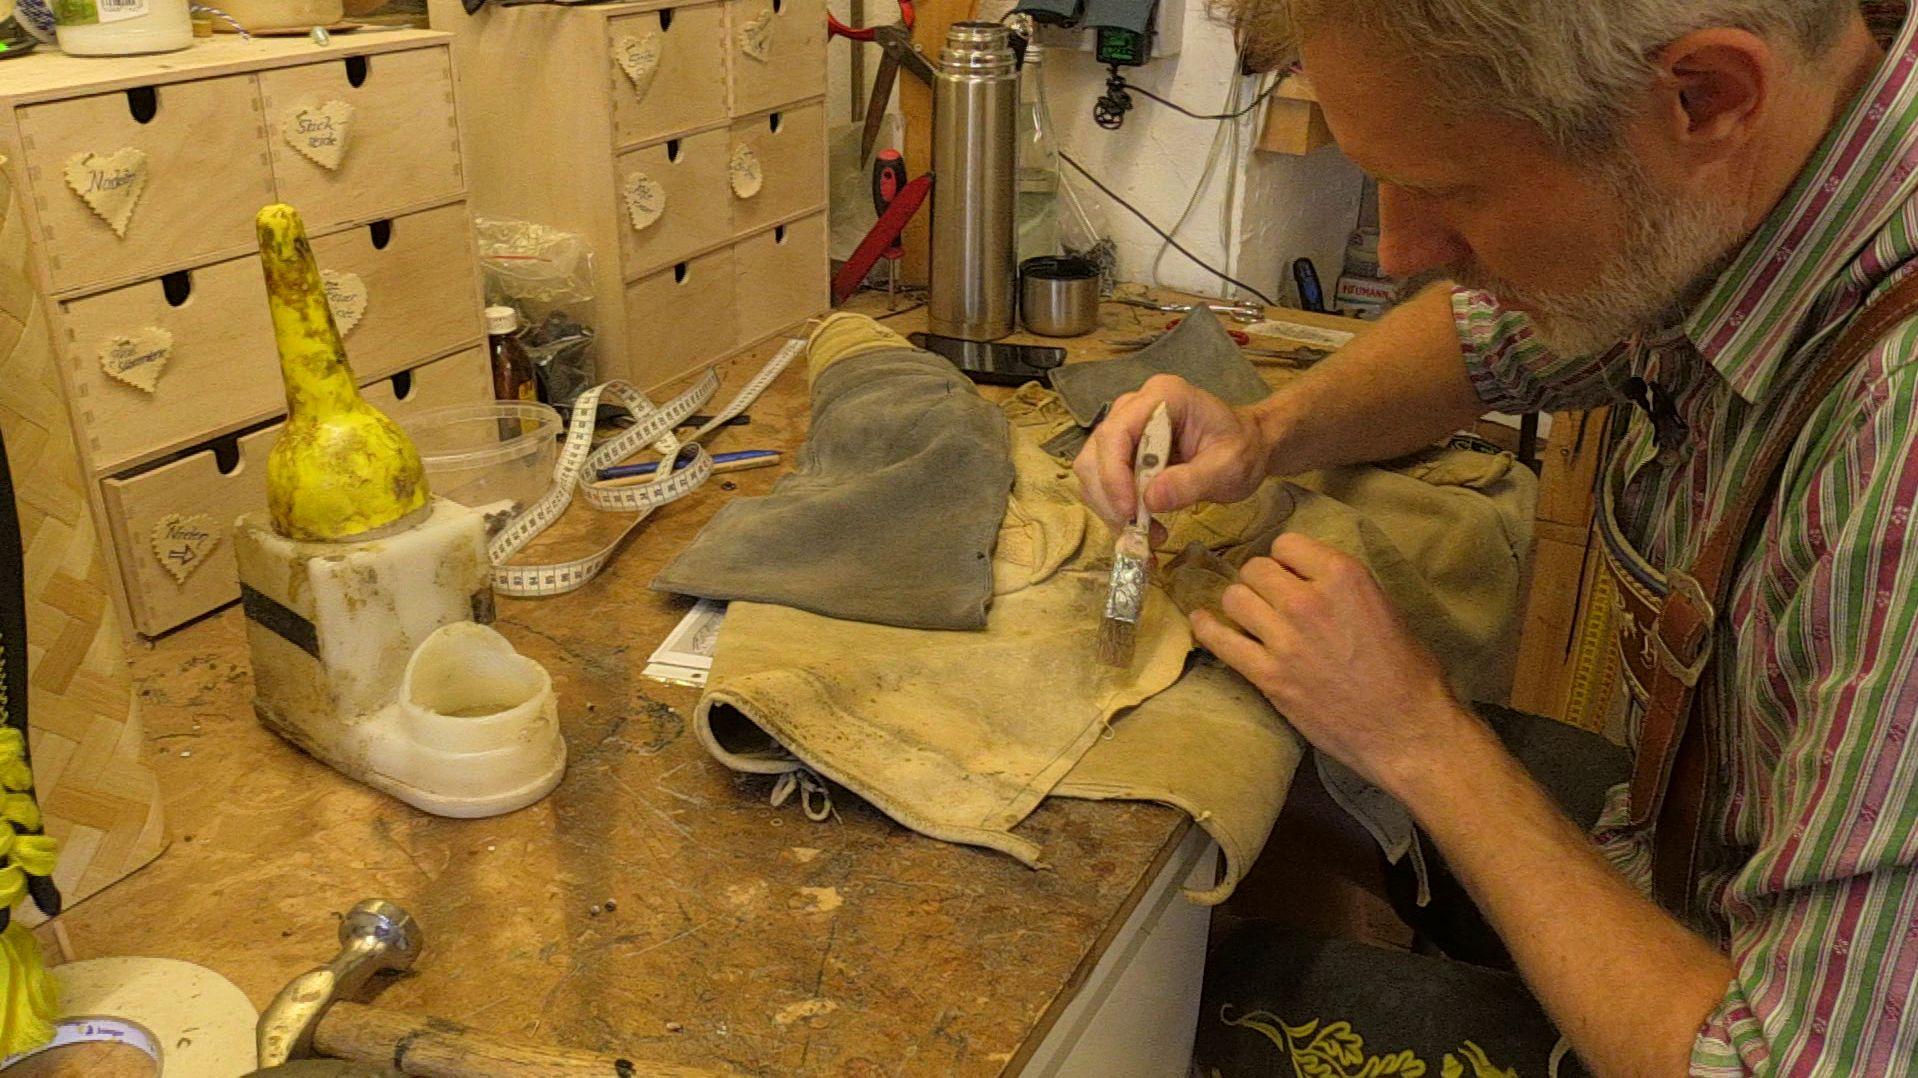 Lederhosenexperte Michael Auer beim Reparieren einer Lederhose.